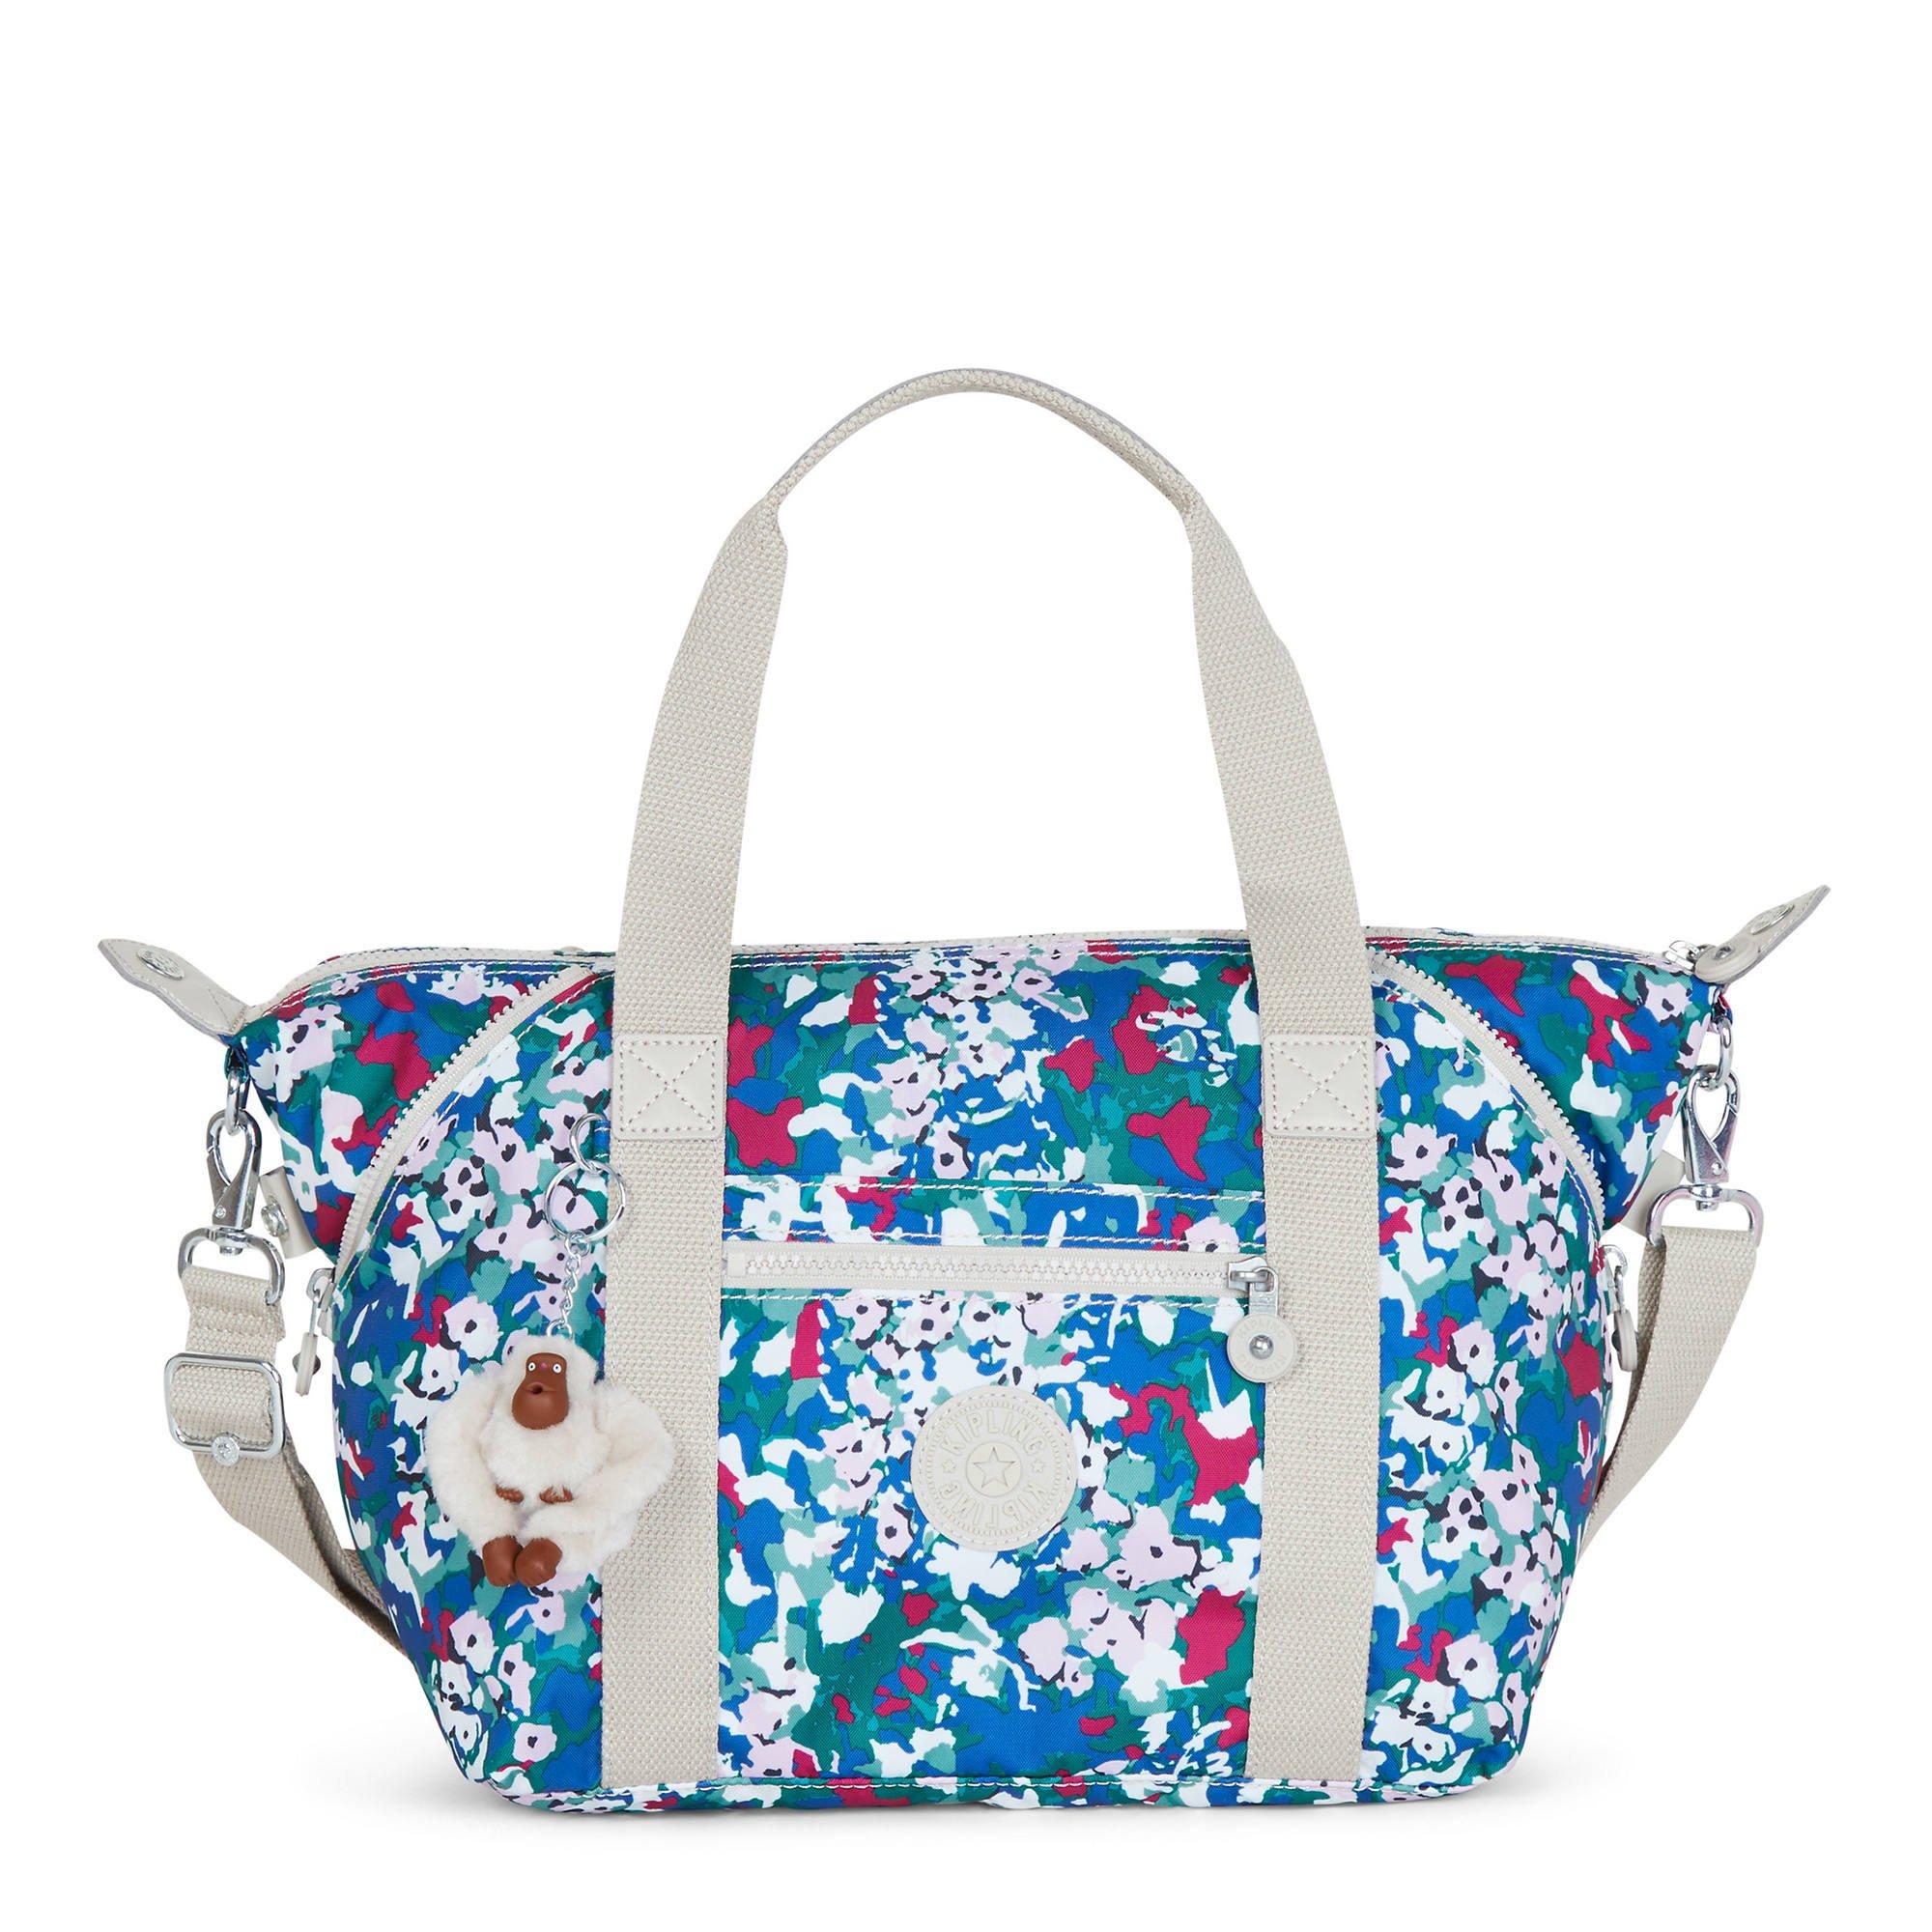 Kipling Women's Art S Printed Handbag One Size Tinted Floral